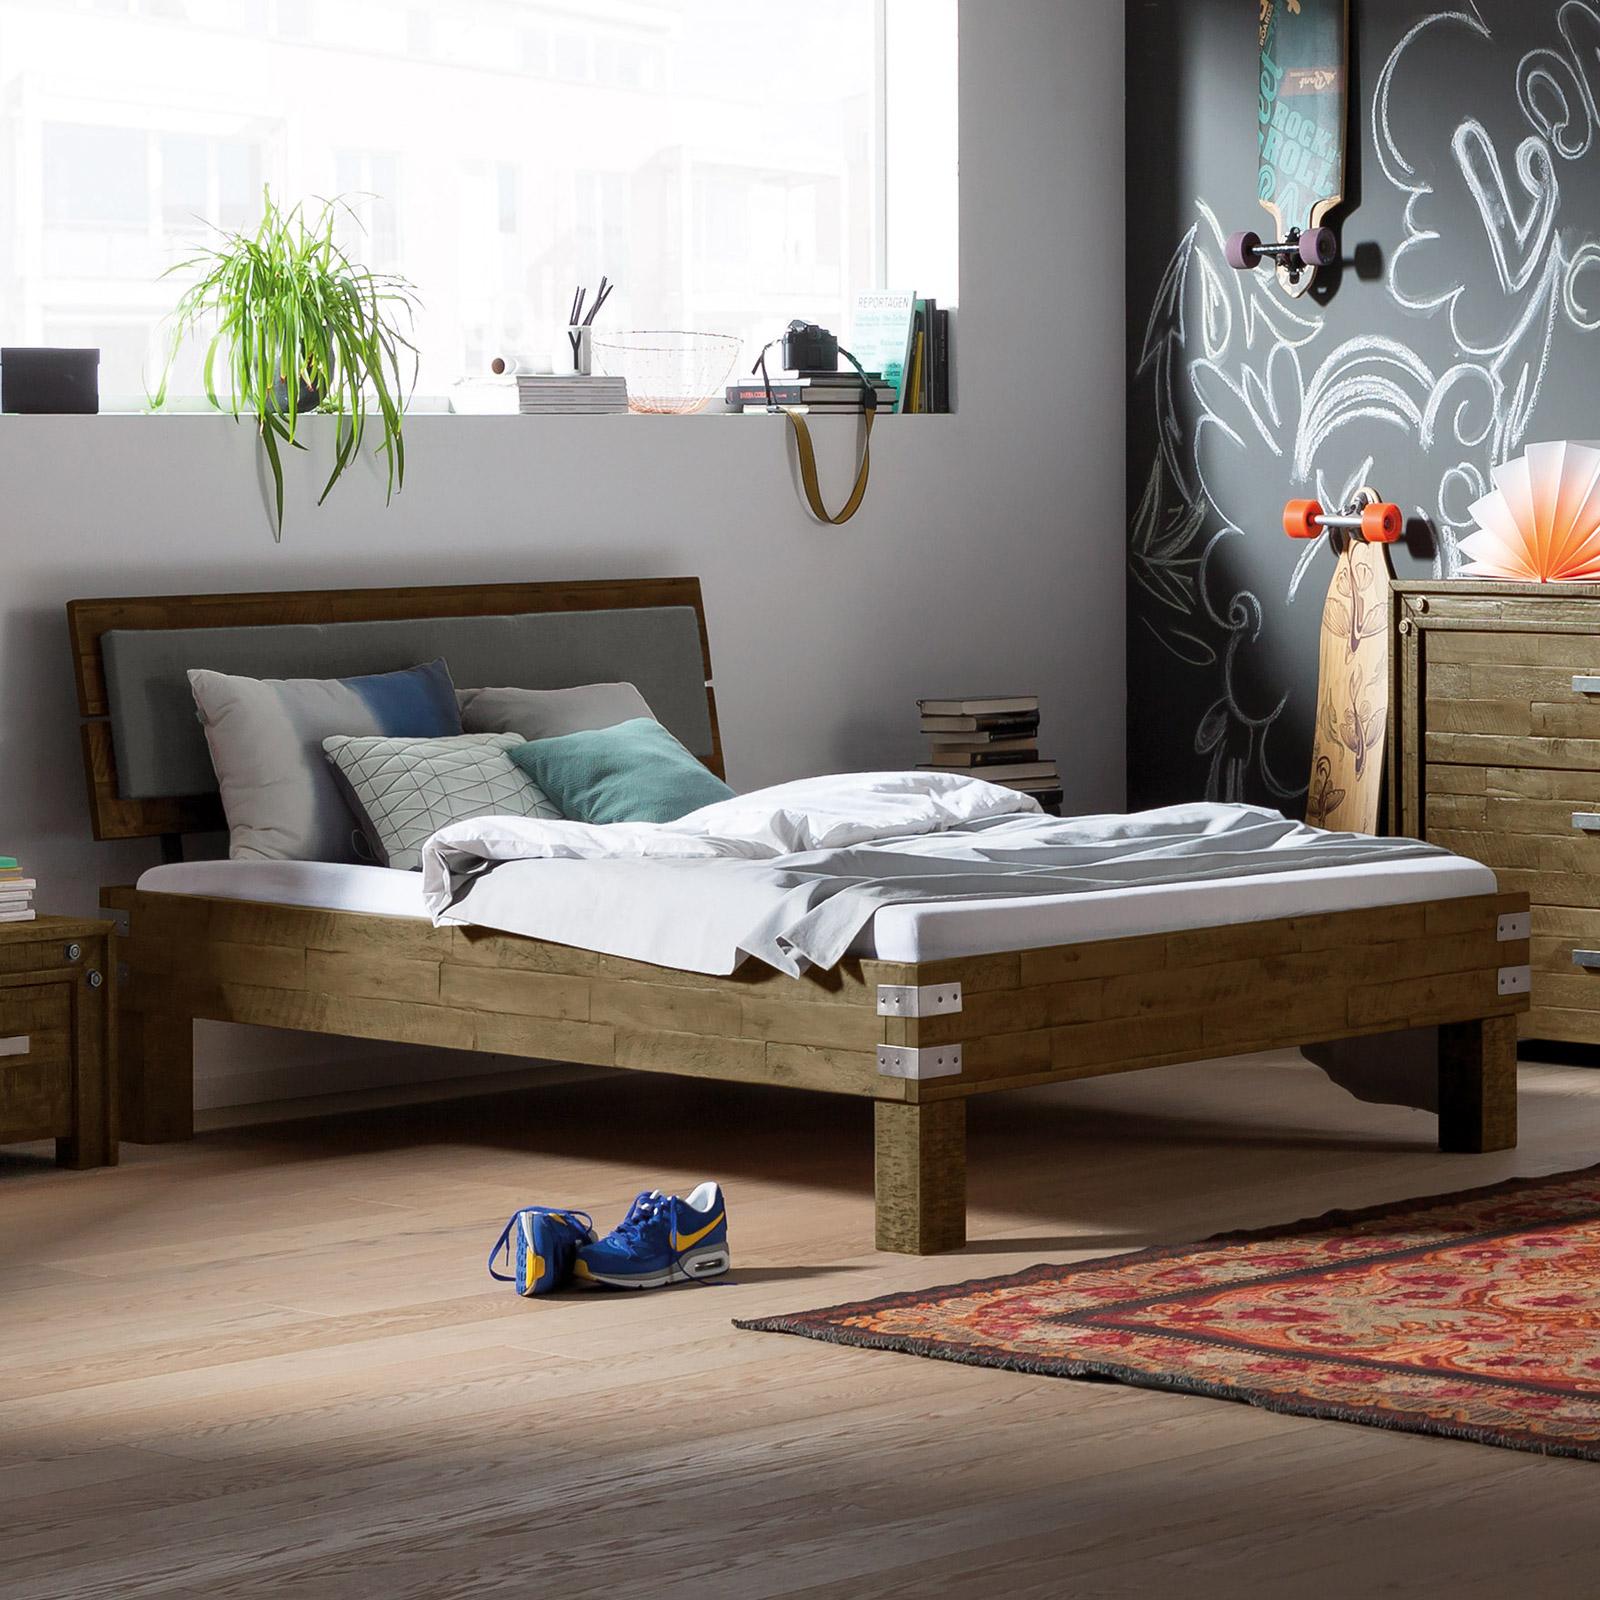 Jugendbett aus akazie im industrial style felipe - Bett industrial ...